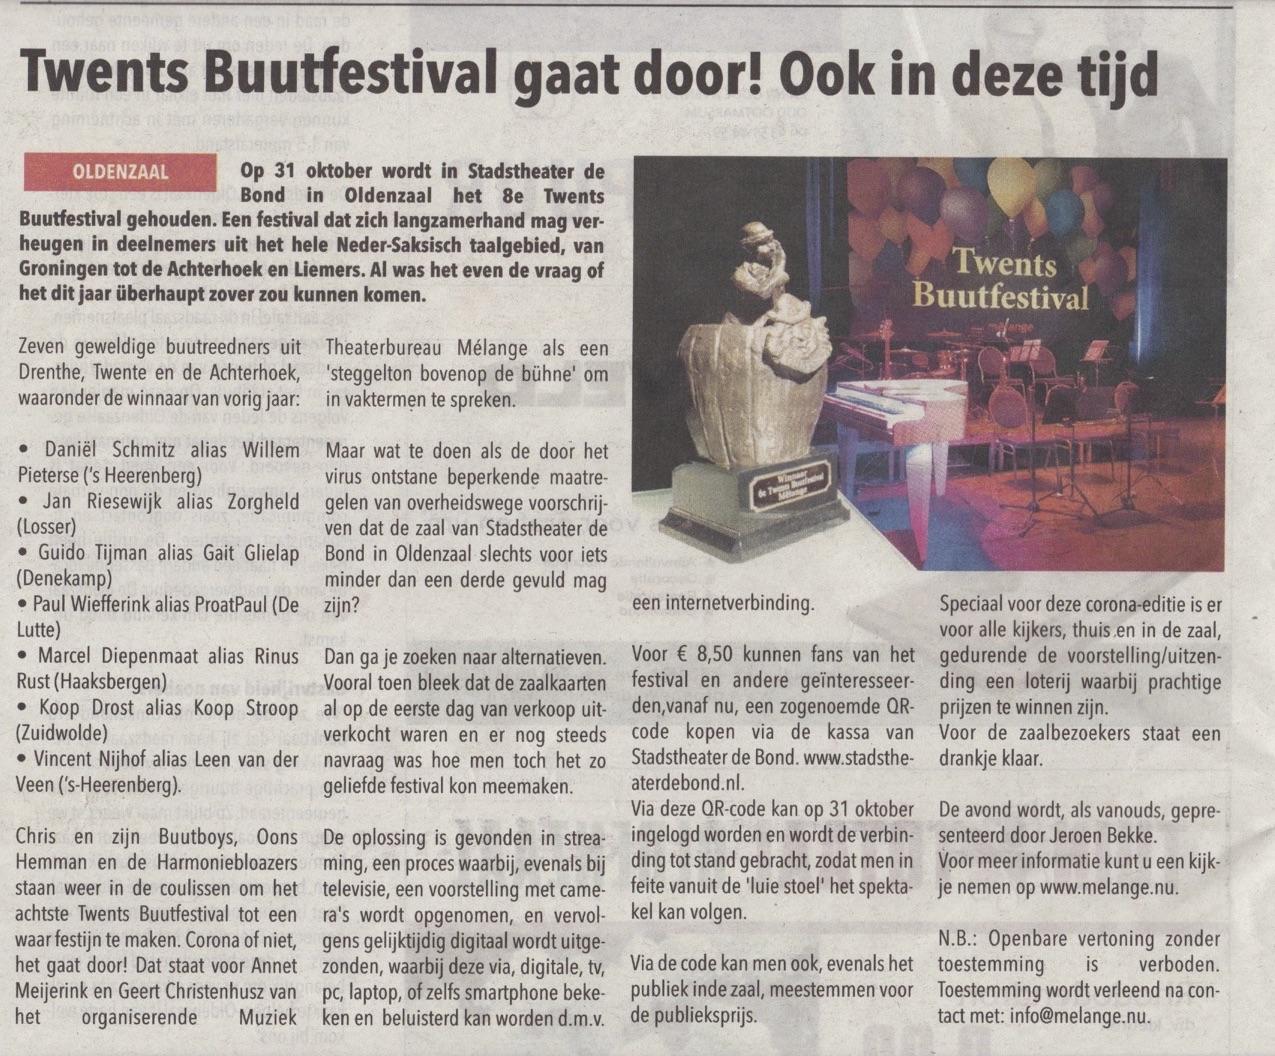 Artikel-Hartkkranten.nl-Buutfestival_25-9-2020